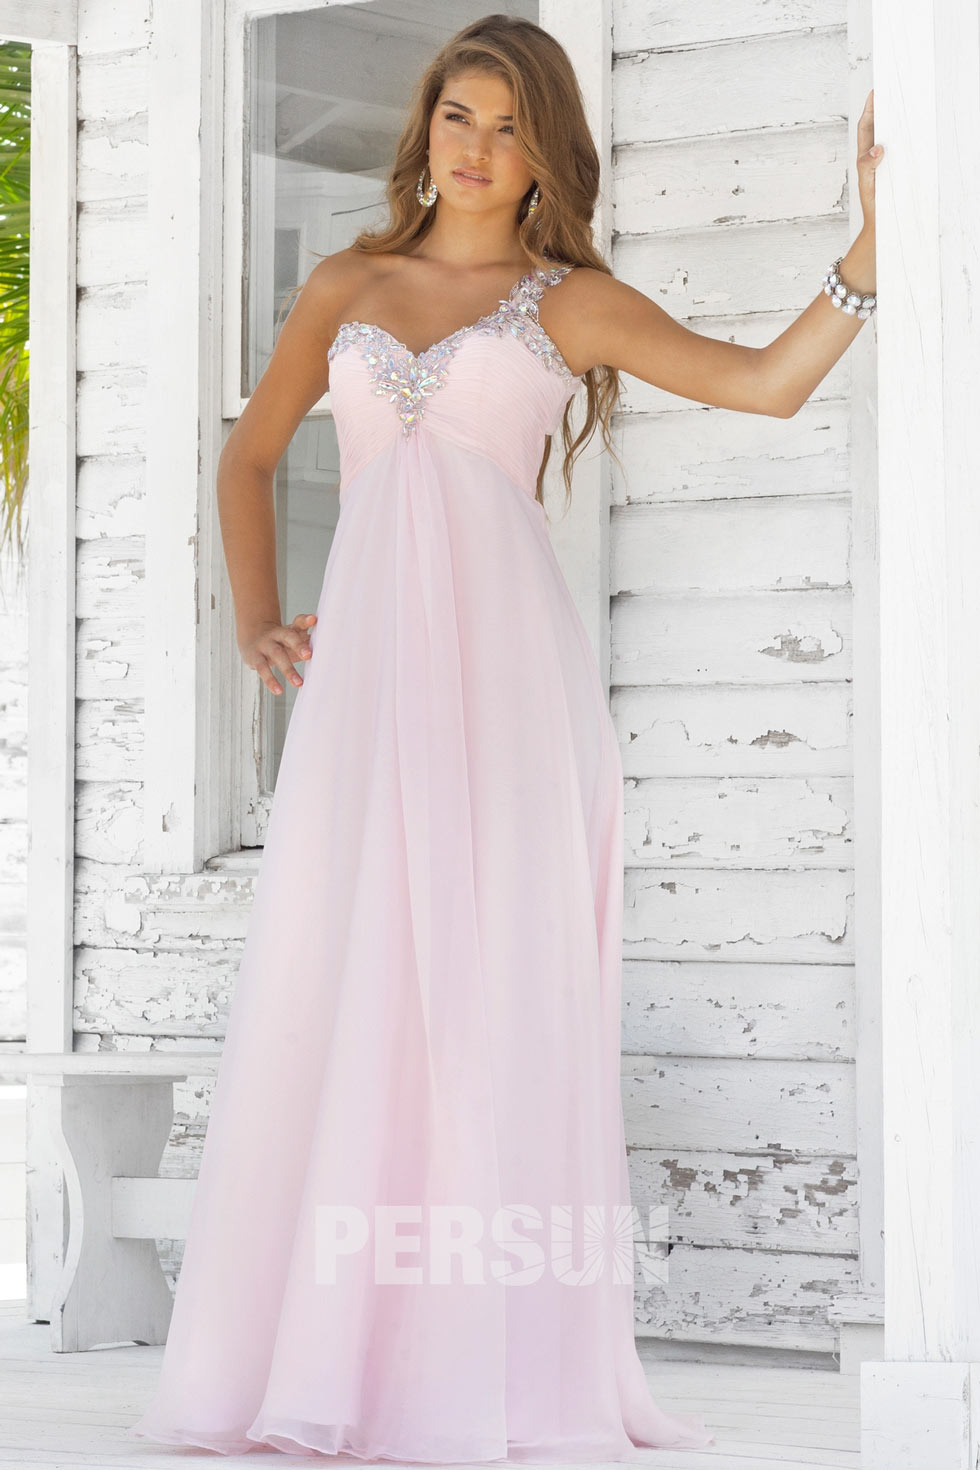 robe rose longue sol pas cher